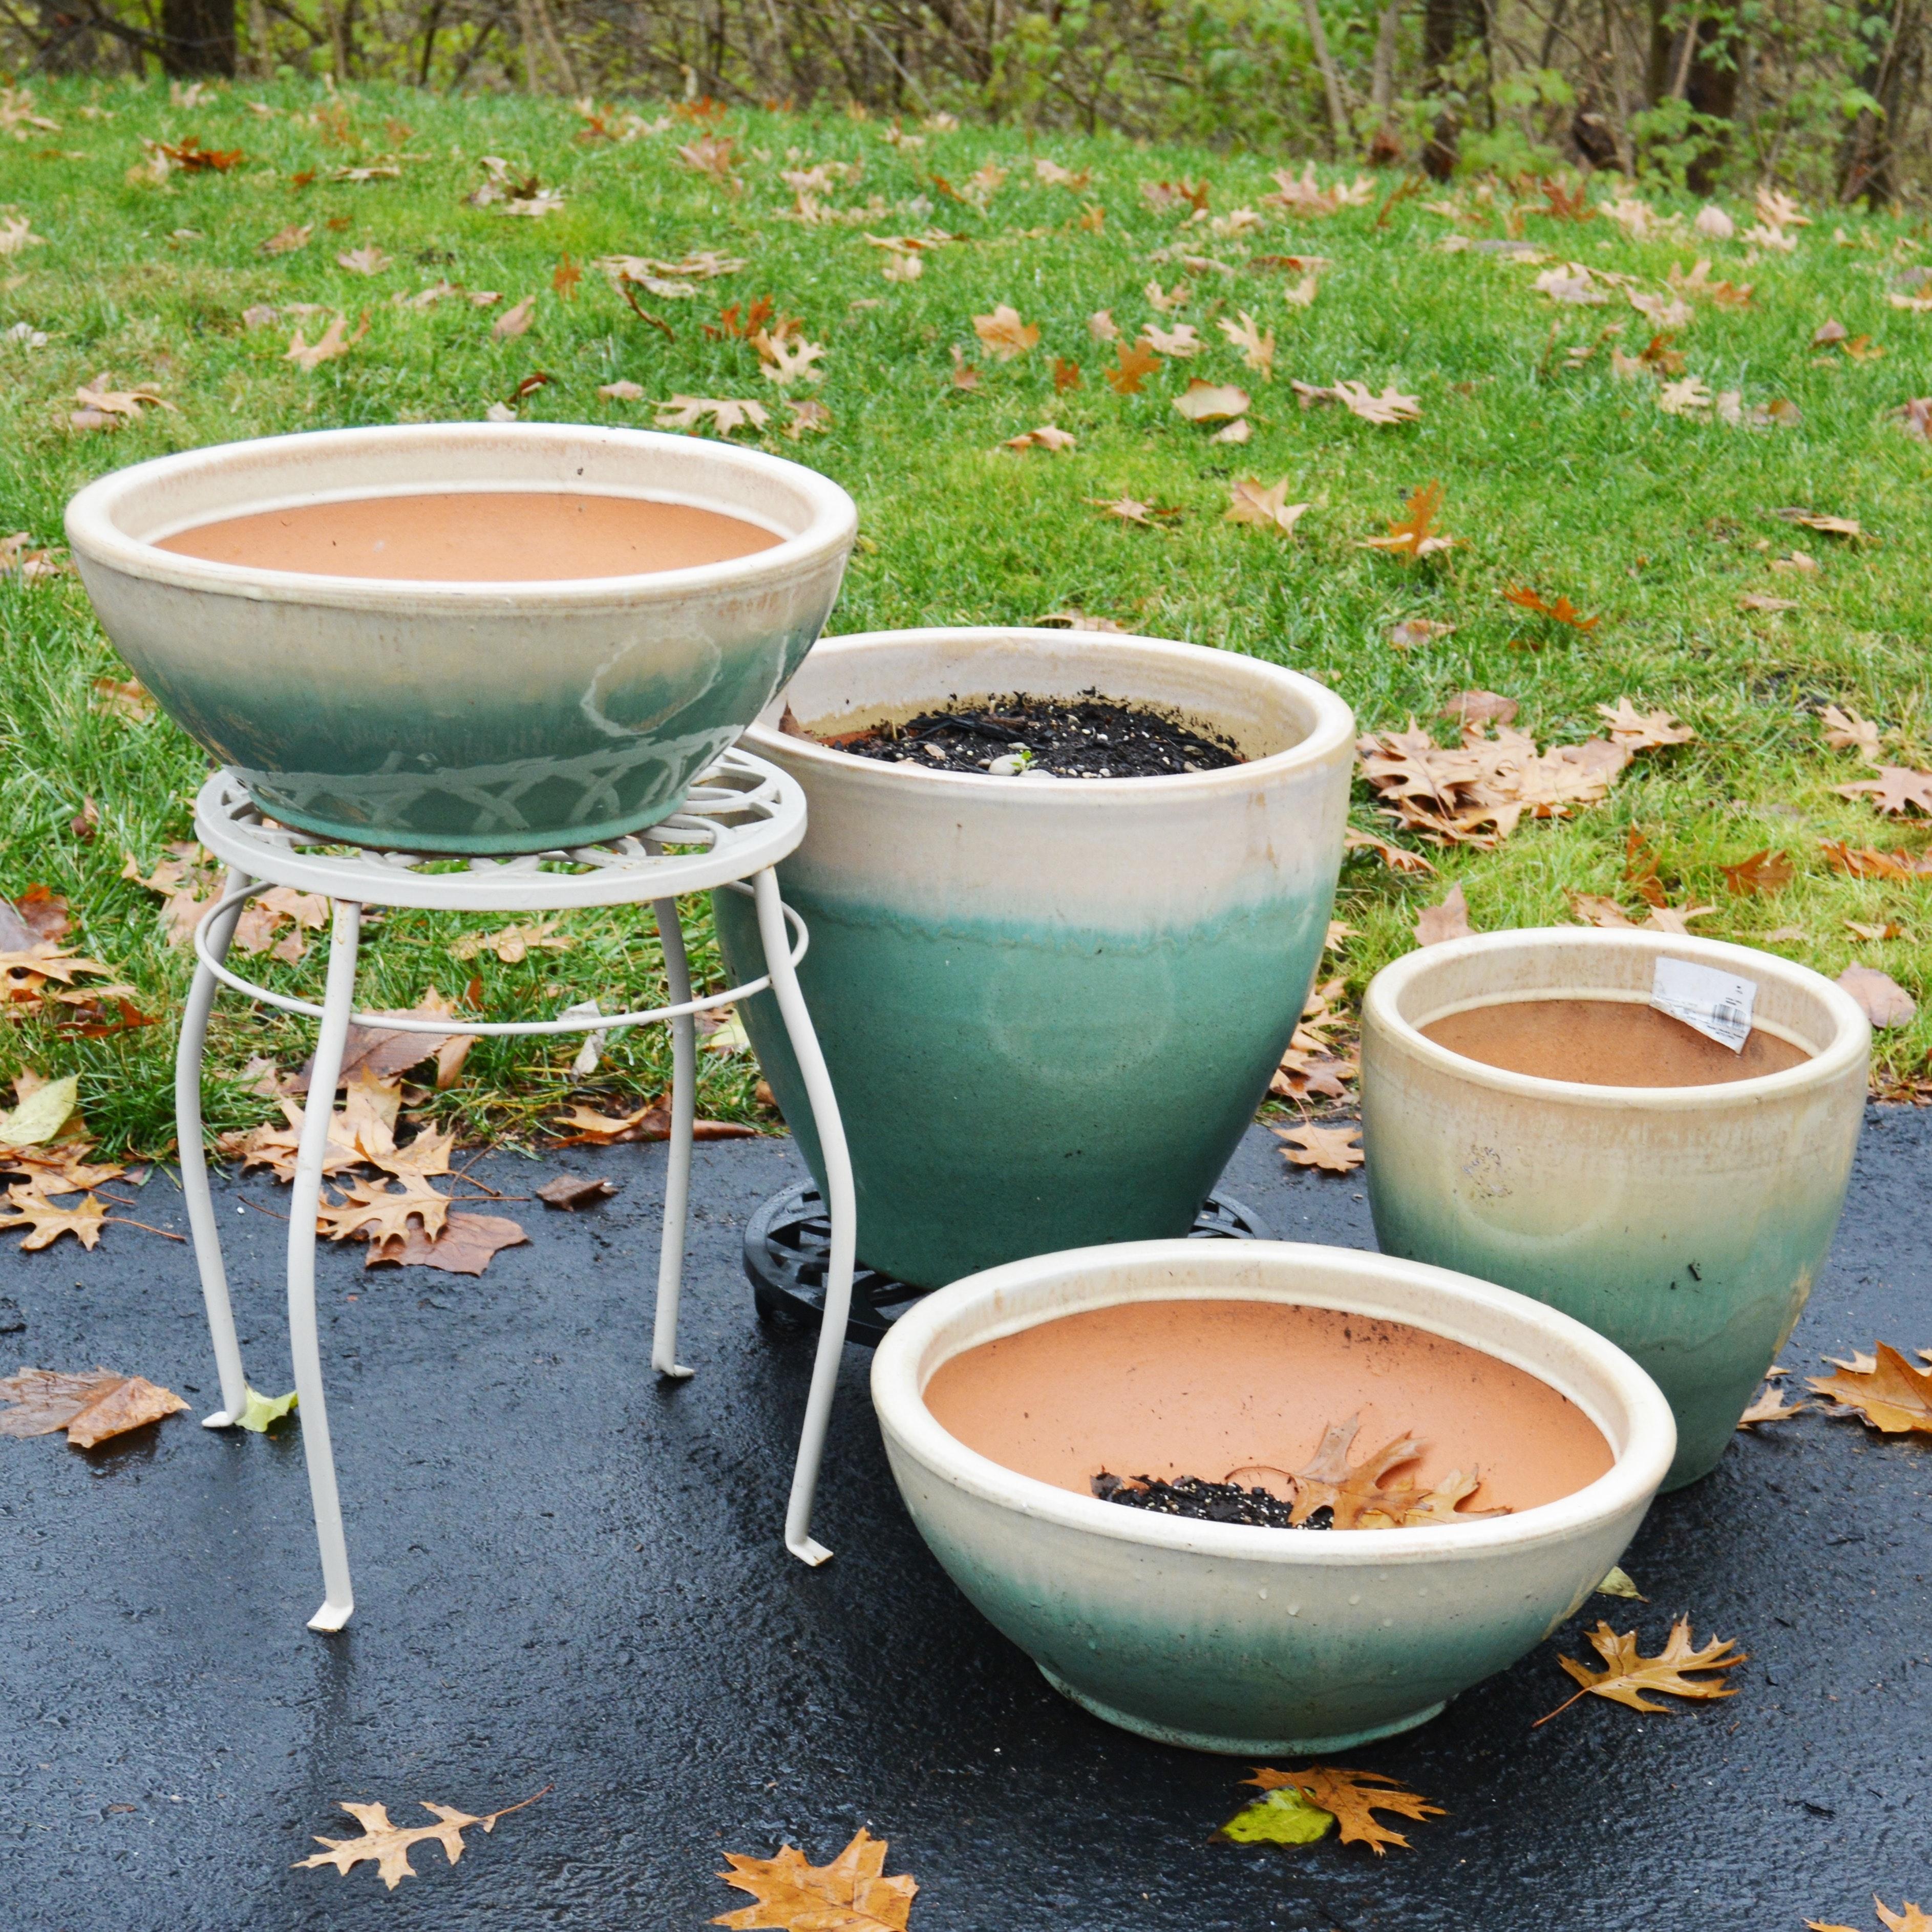 Two-Tone Ceramic Planters